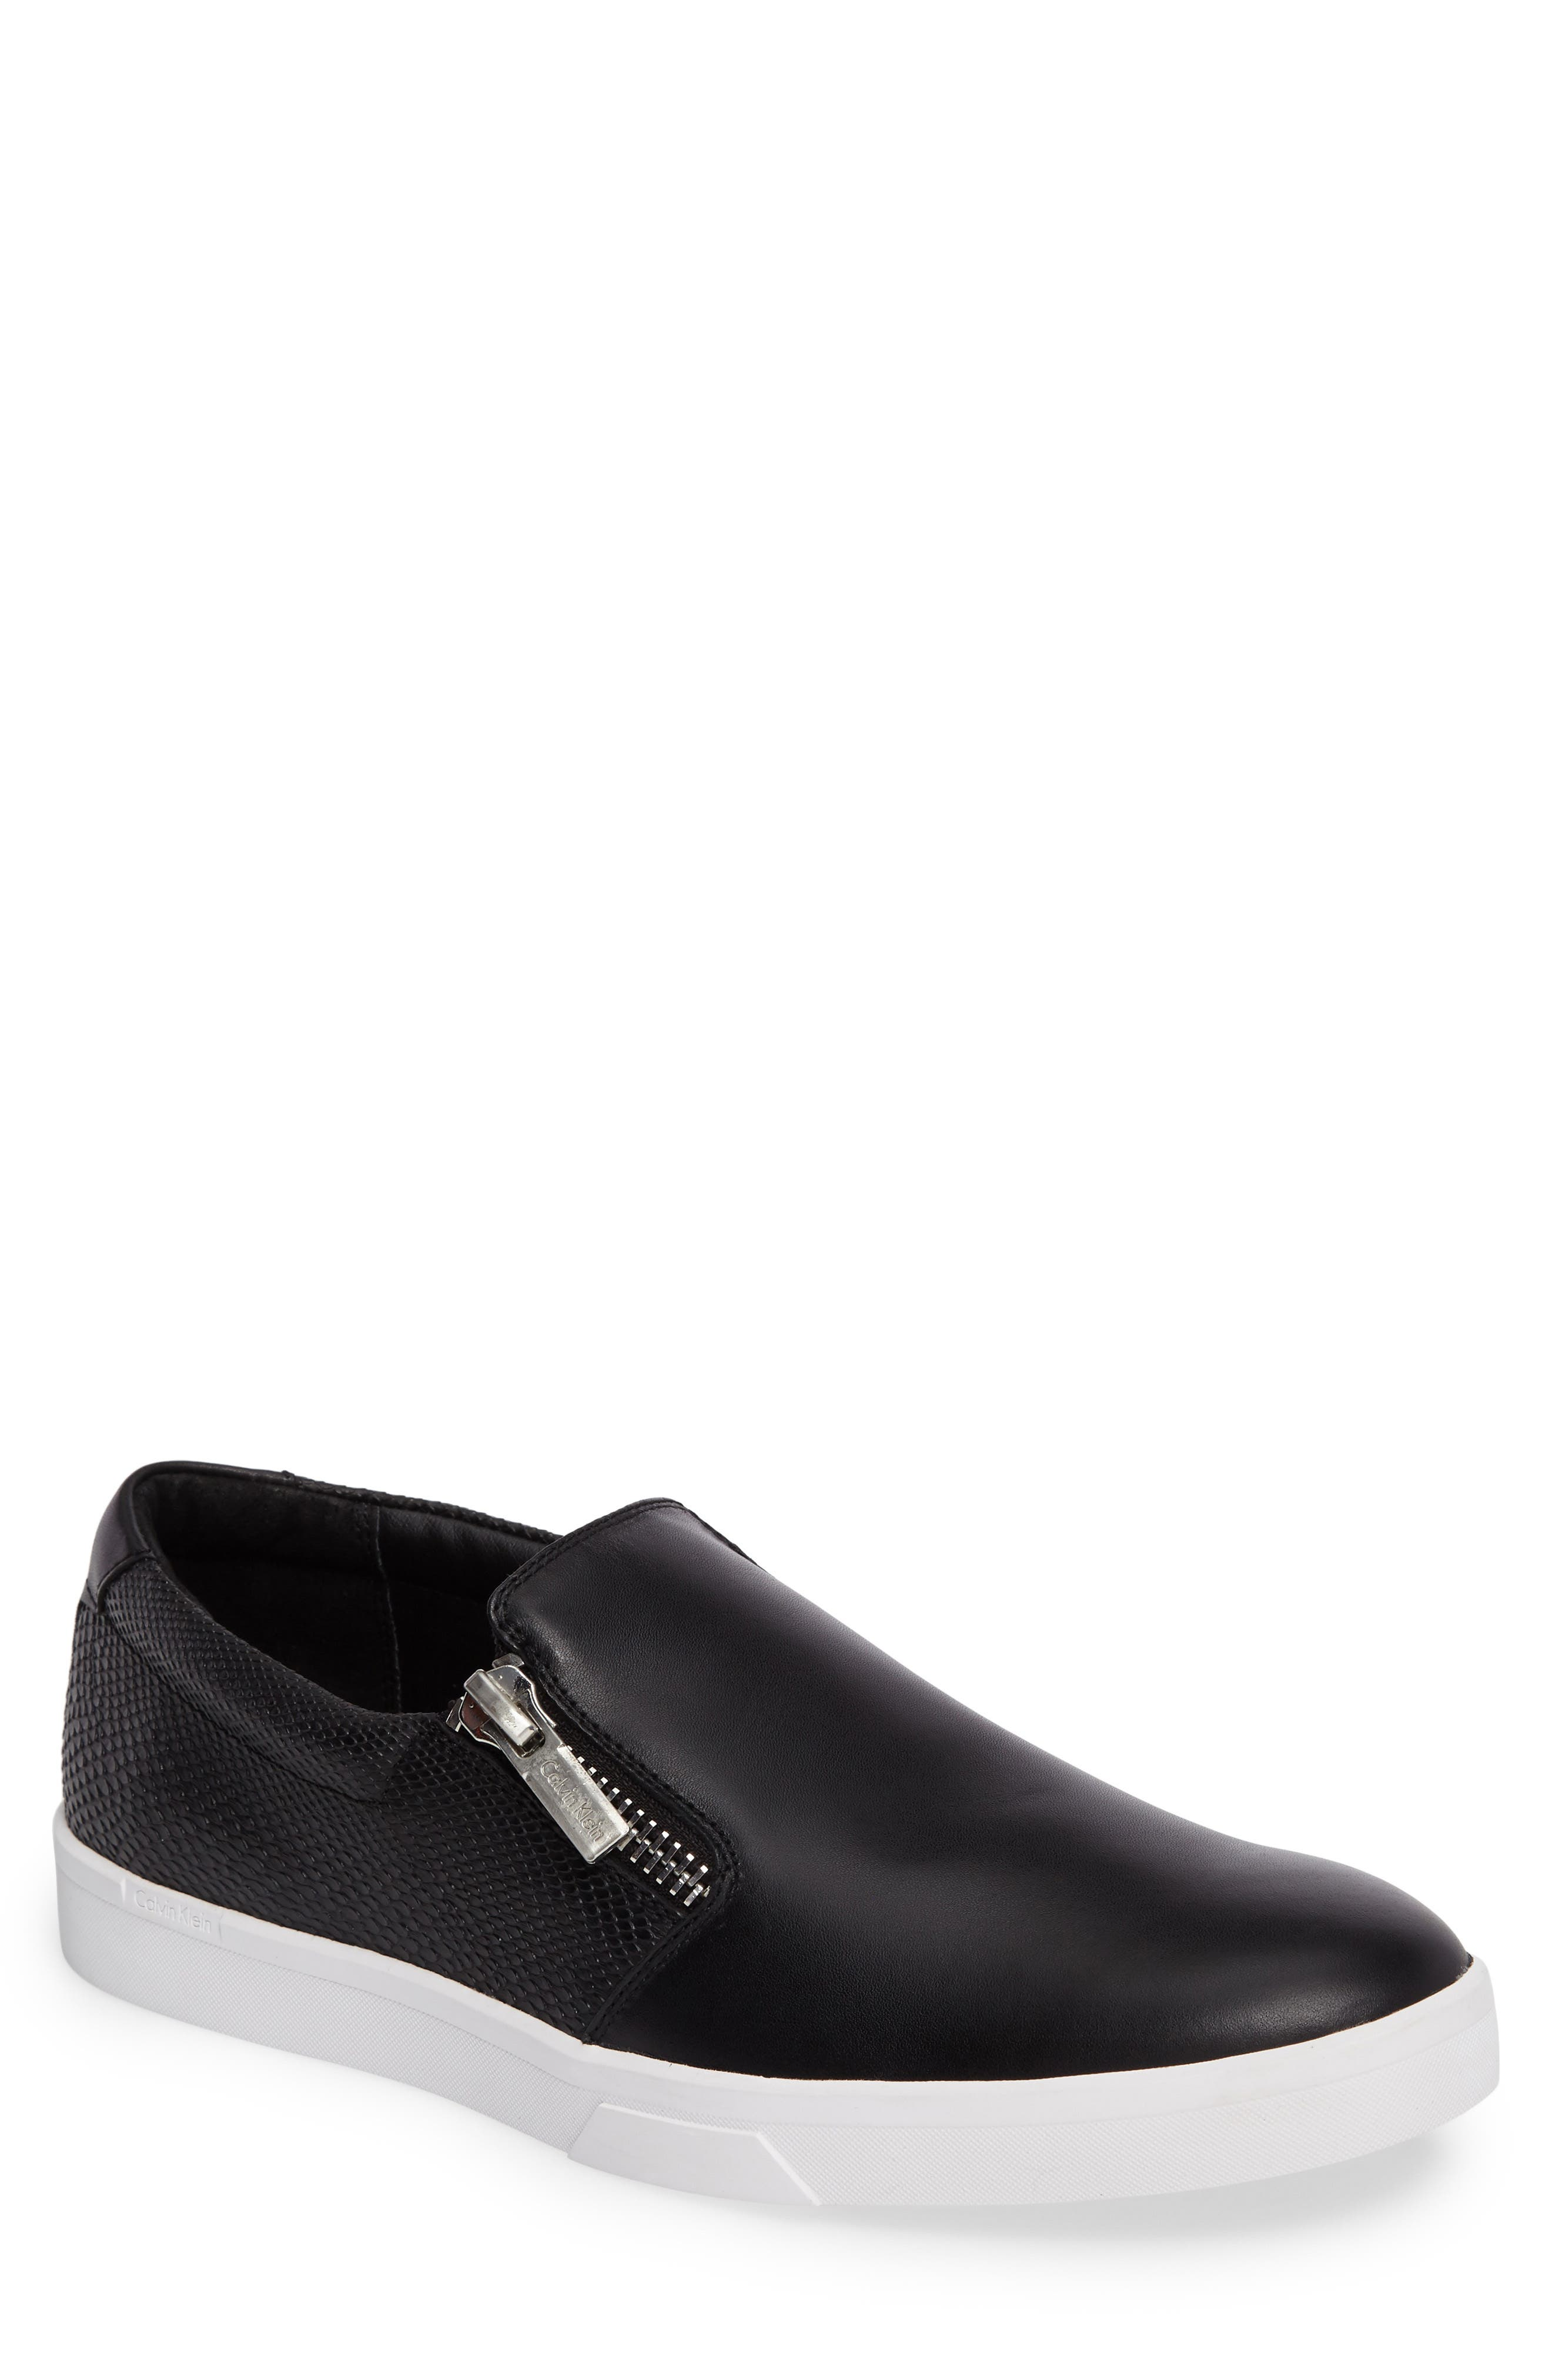 Main Image - Calvin Klein Ibiza Slip-On Zip Sneaker (Men)